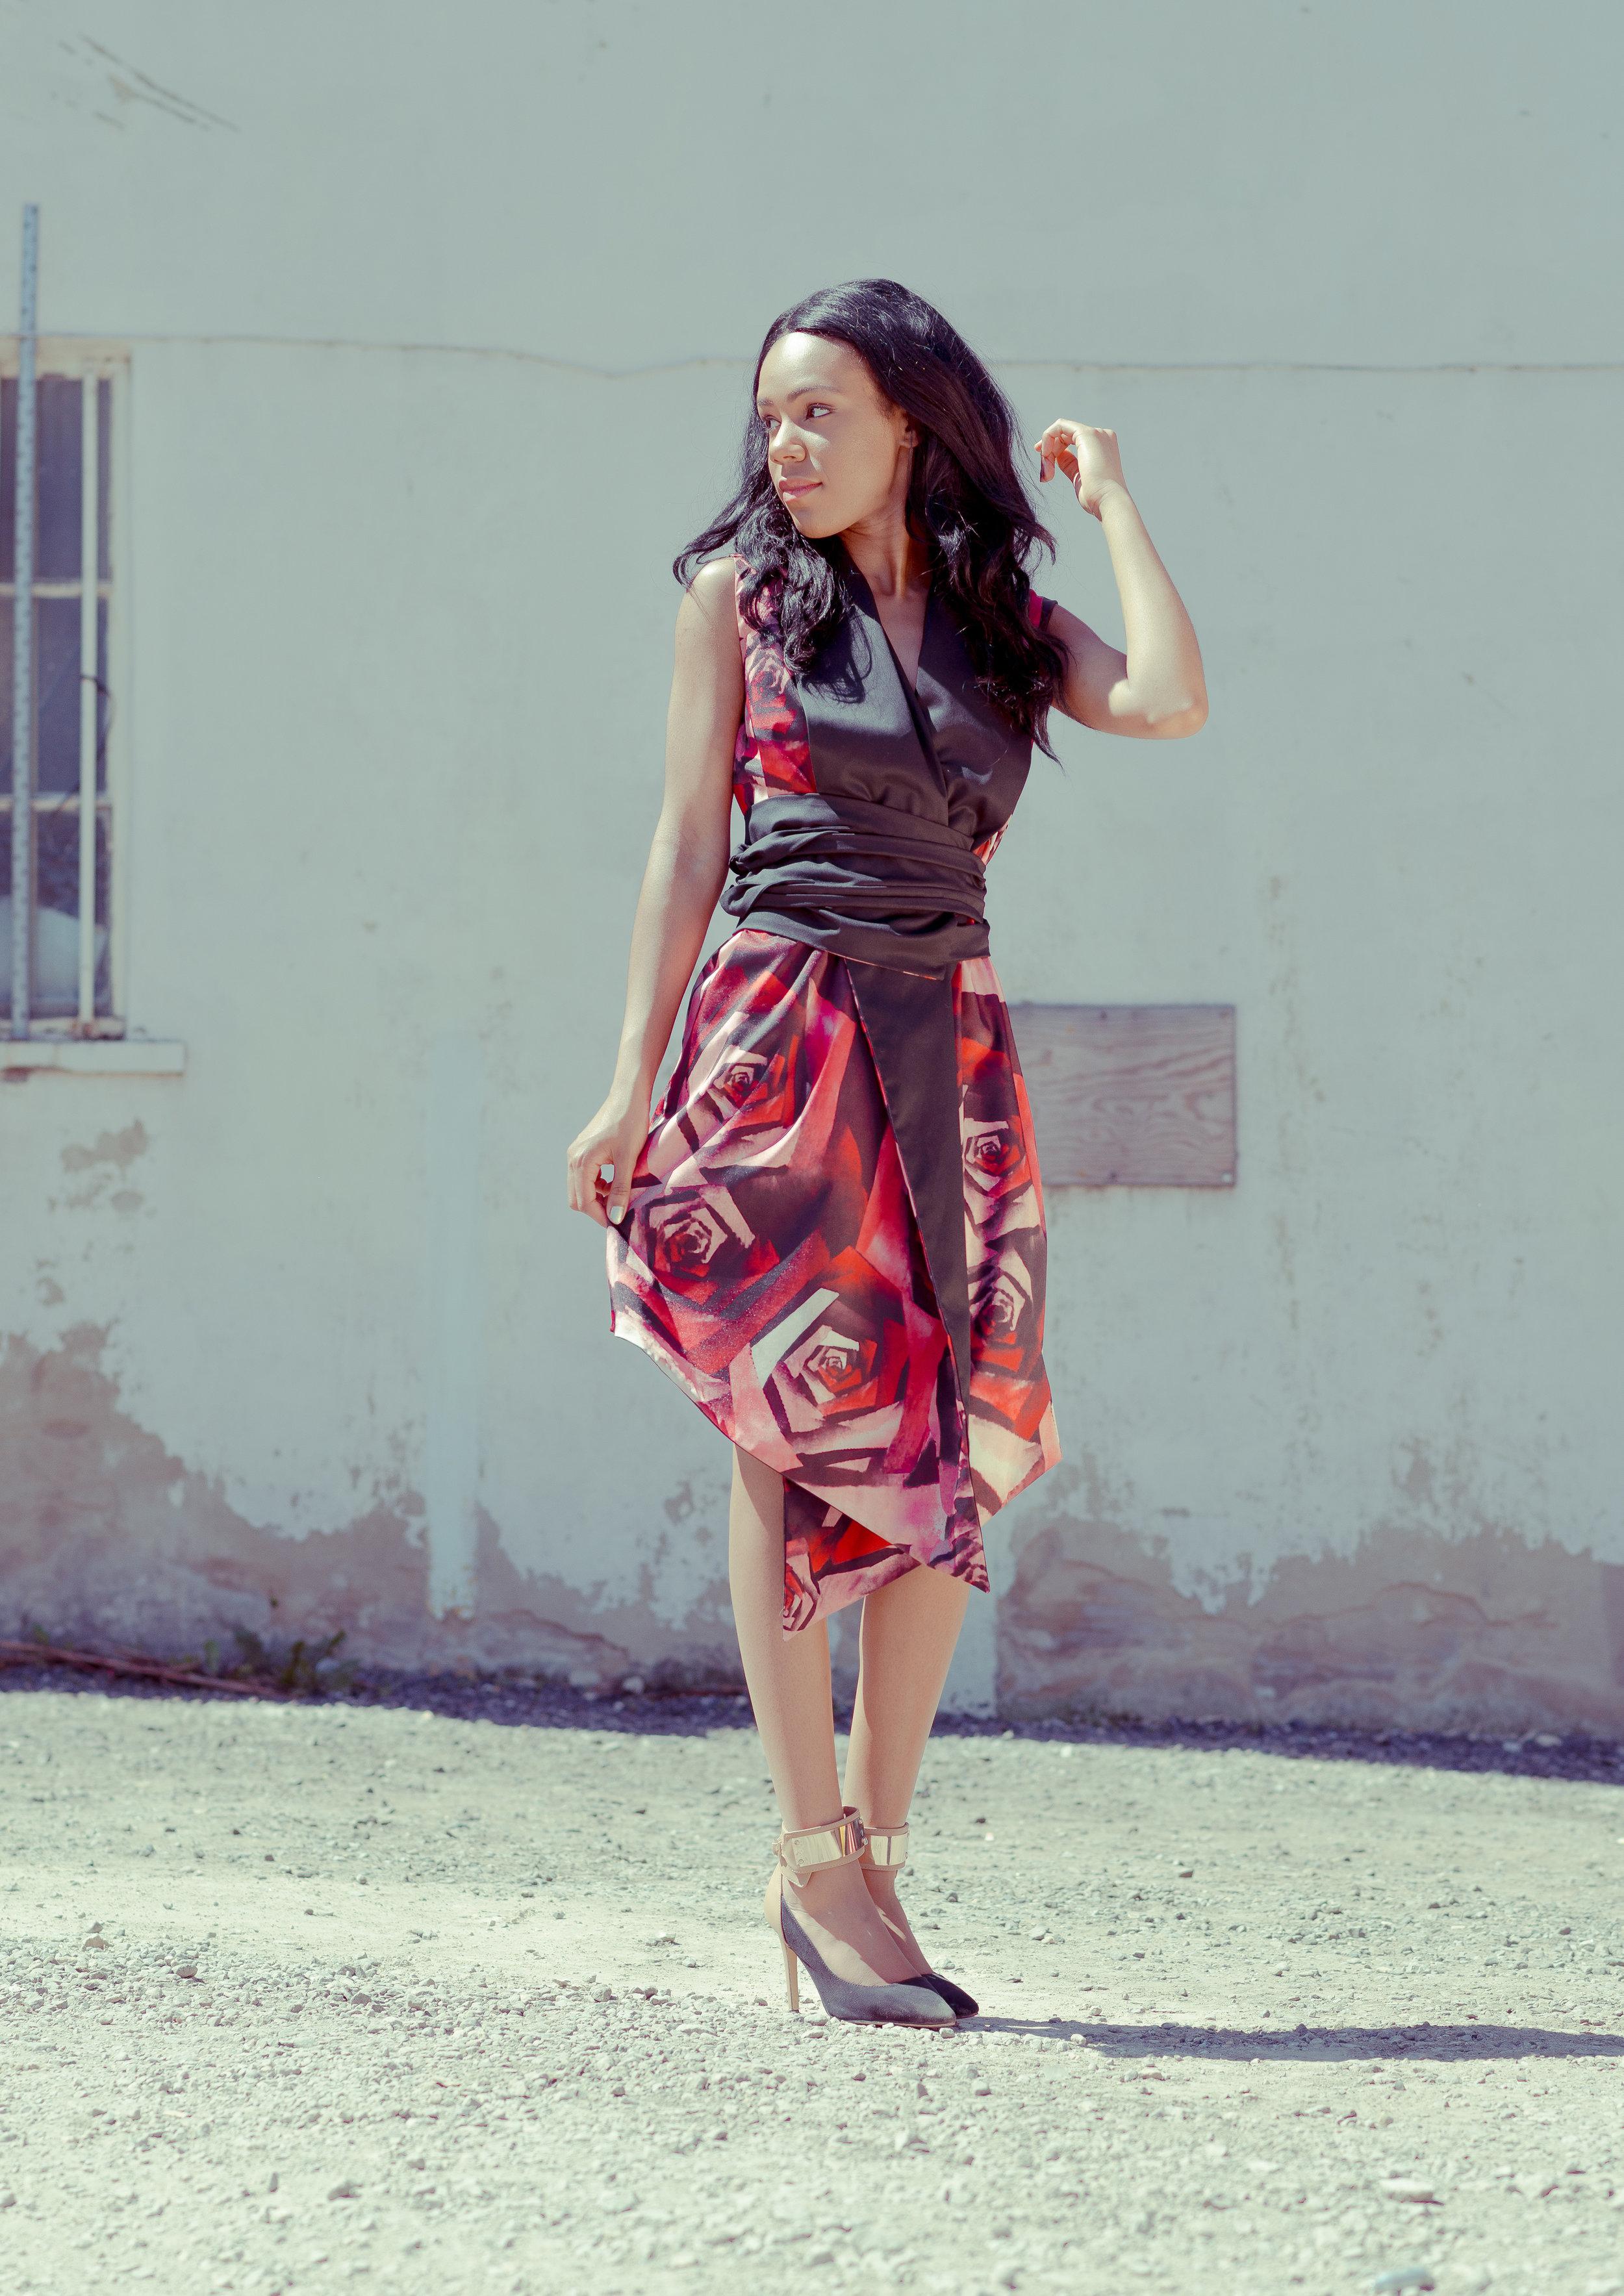 zaramia-ava-zaramiaava-leeds-fashion-designer-ethical-sustainable-tailored-minimalist-emi-red-print-black-jacket-belt-point-skirt-versatile-drape-cowl-styling-womenswear-models-4